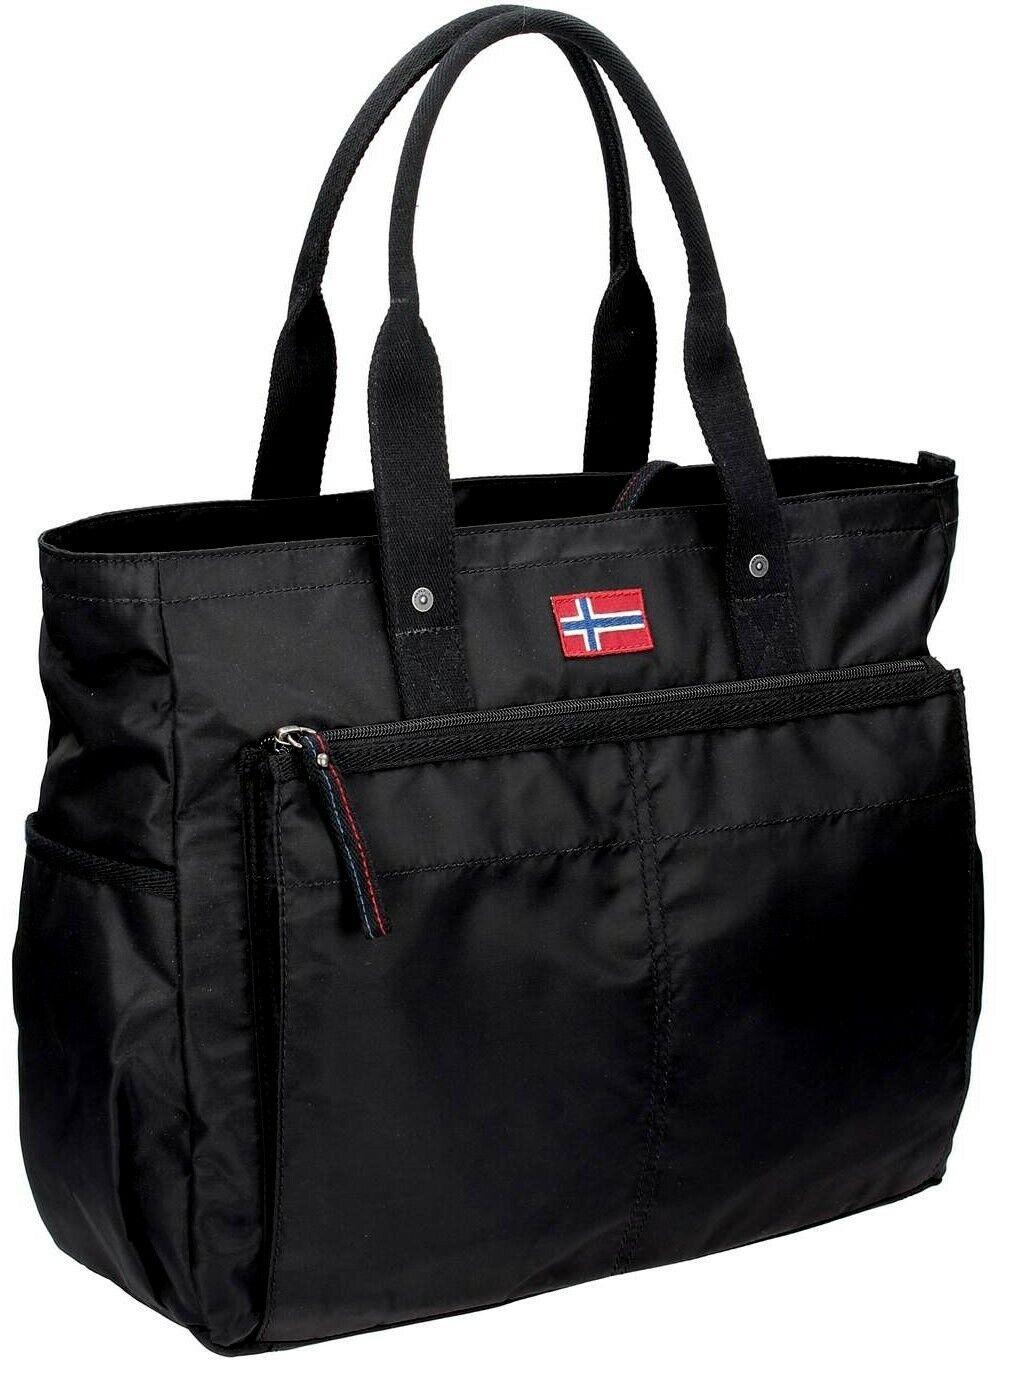 Borsa Mare Shopping Napapijri Donna Bag Woman Summer N8O01 Fancy E//W Tote